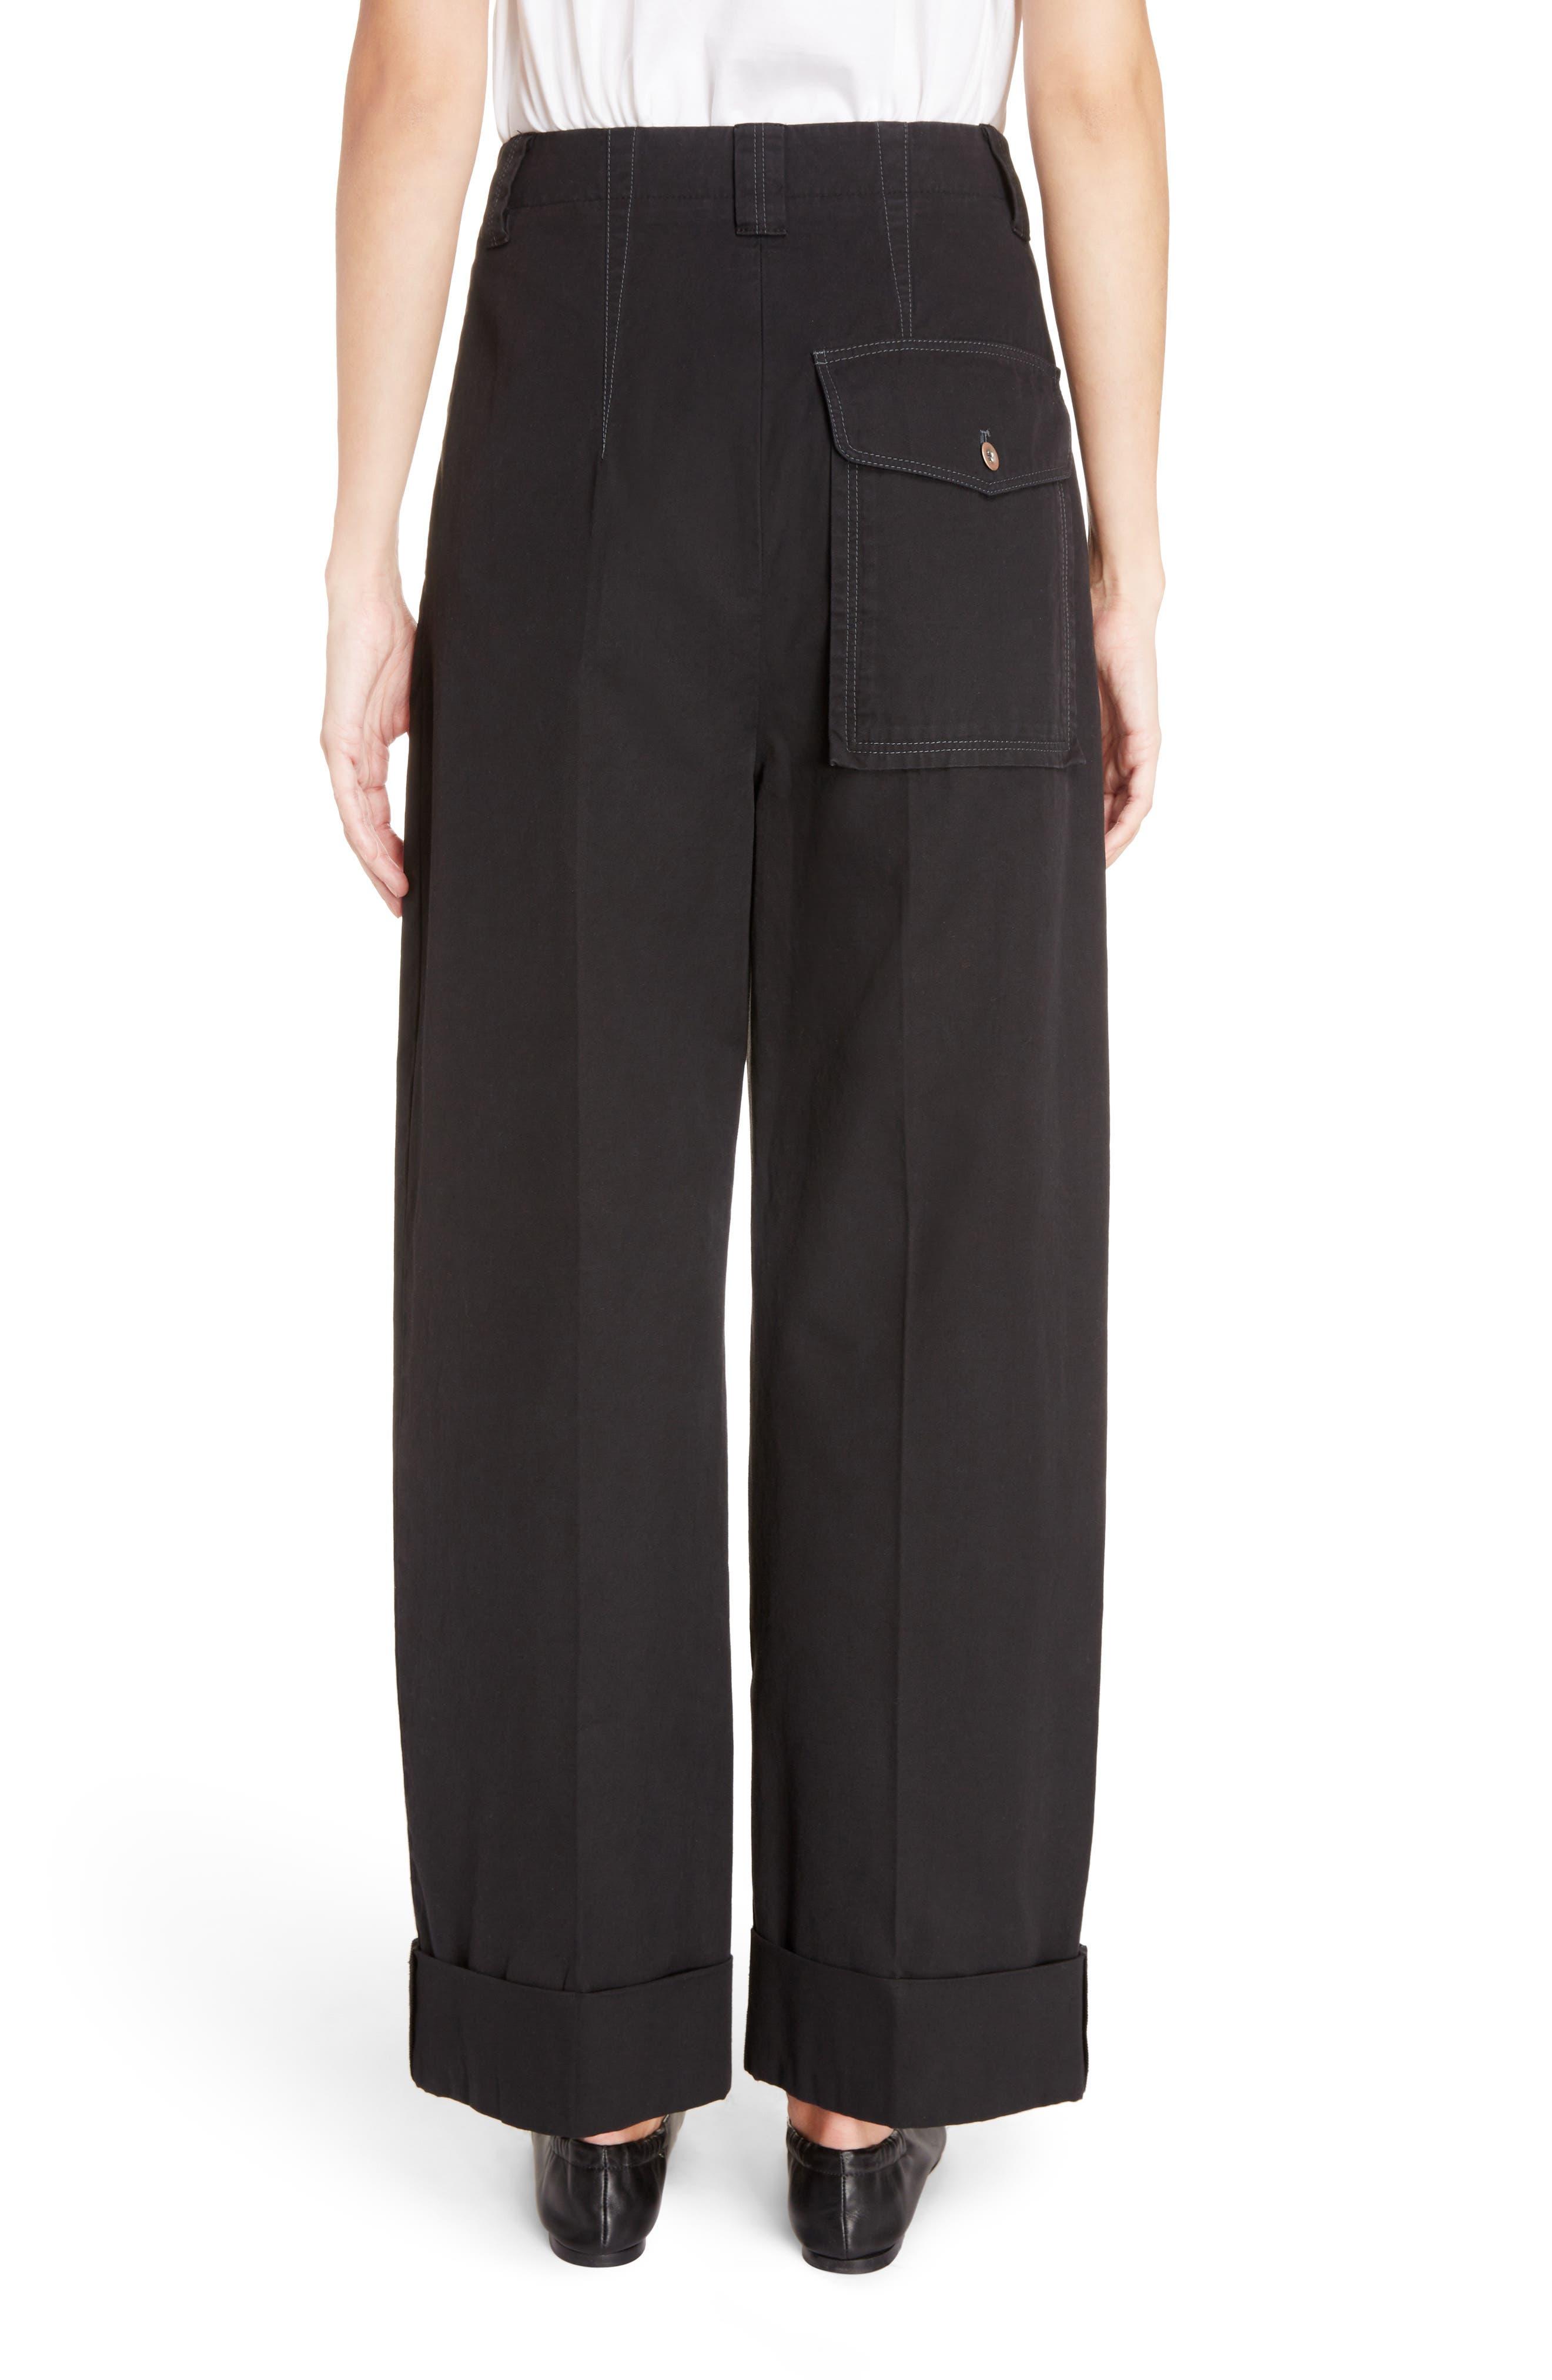 Madya Cuffed Cotton Pants,                             Alternate thumbnail 2, color,                             001